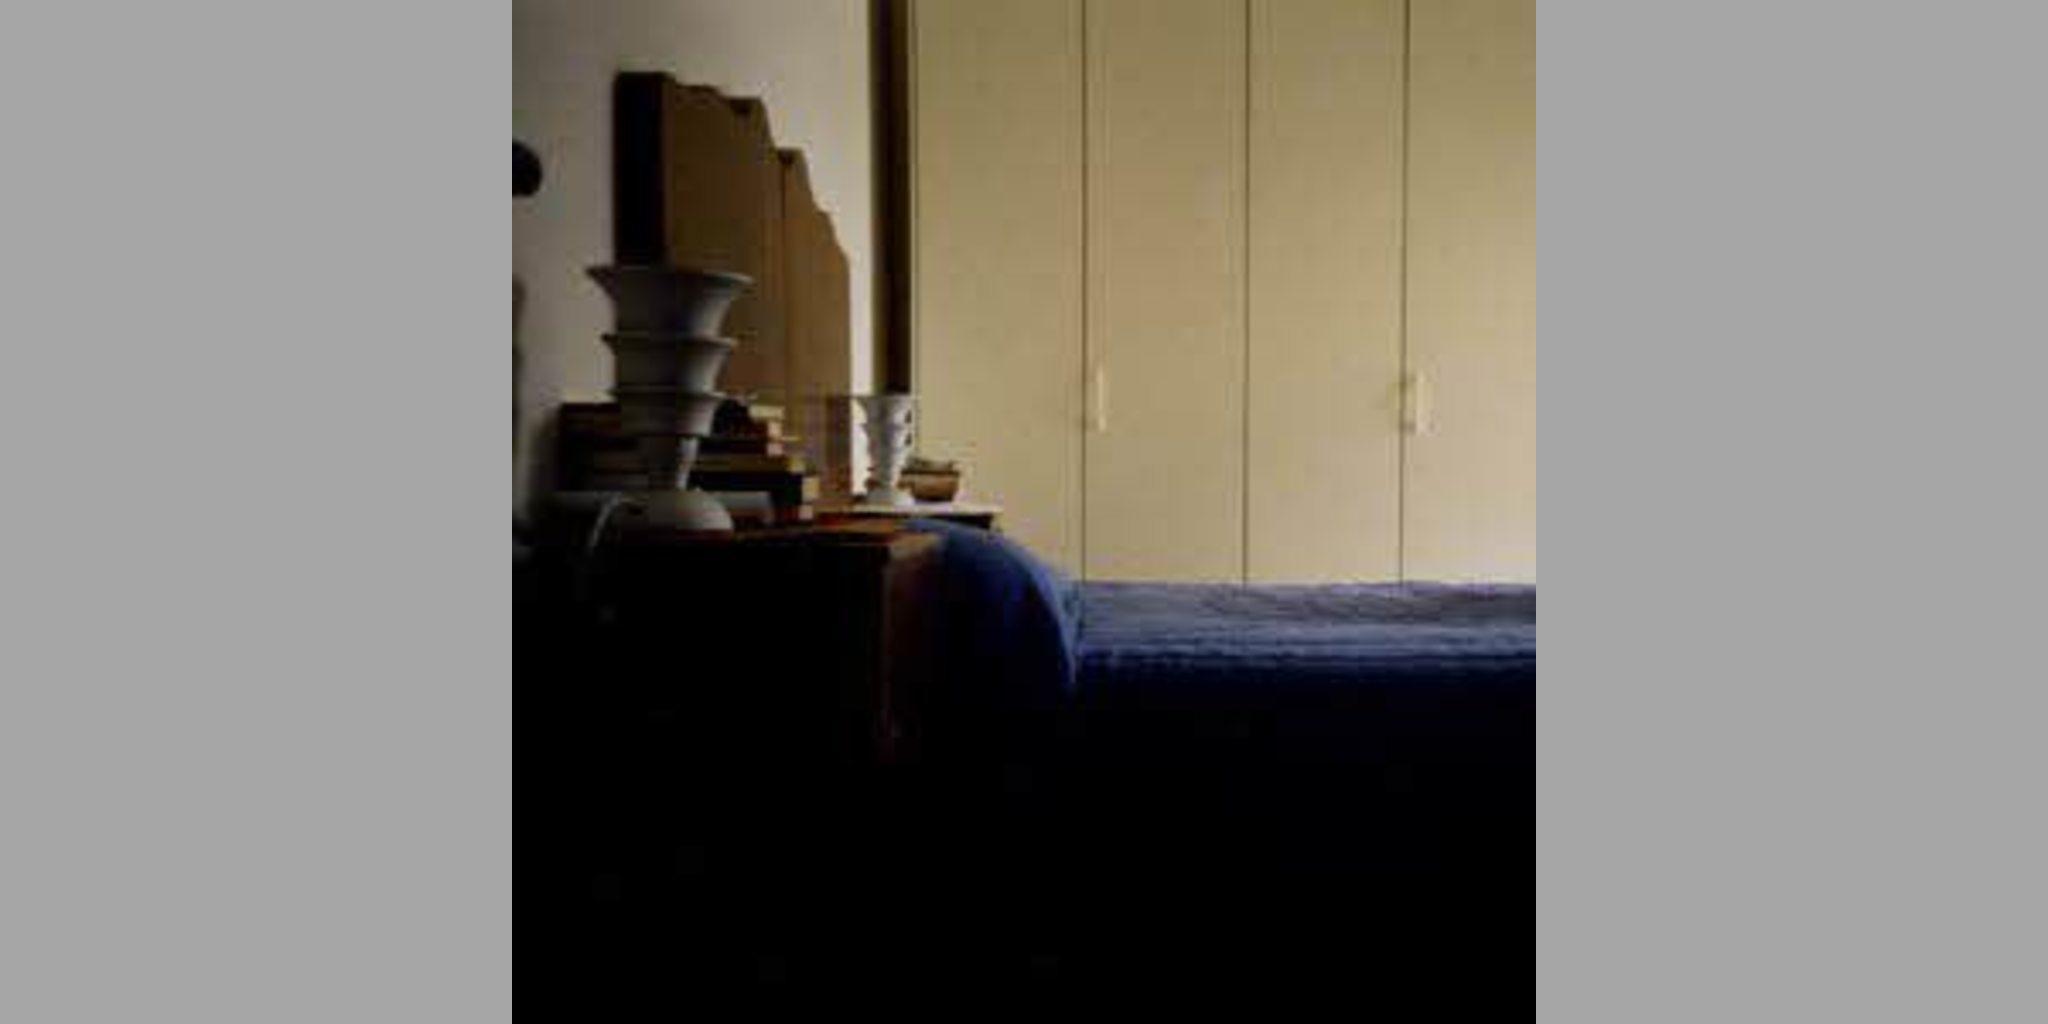 Bed & Breakfast Chignolo D'Isola - Galilei